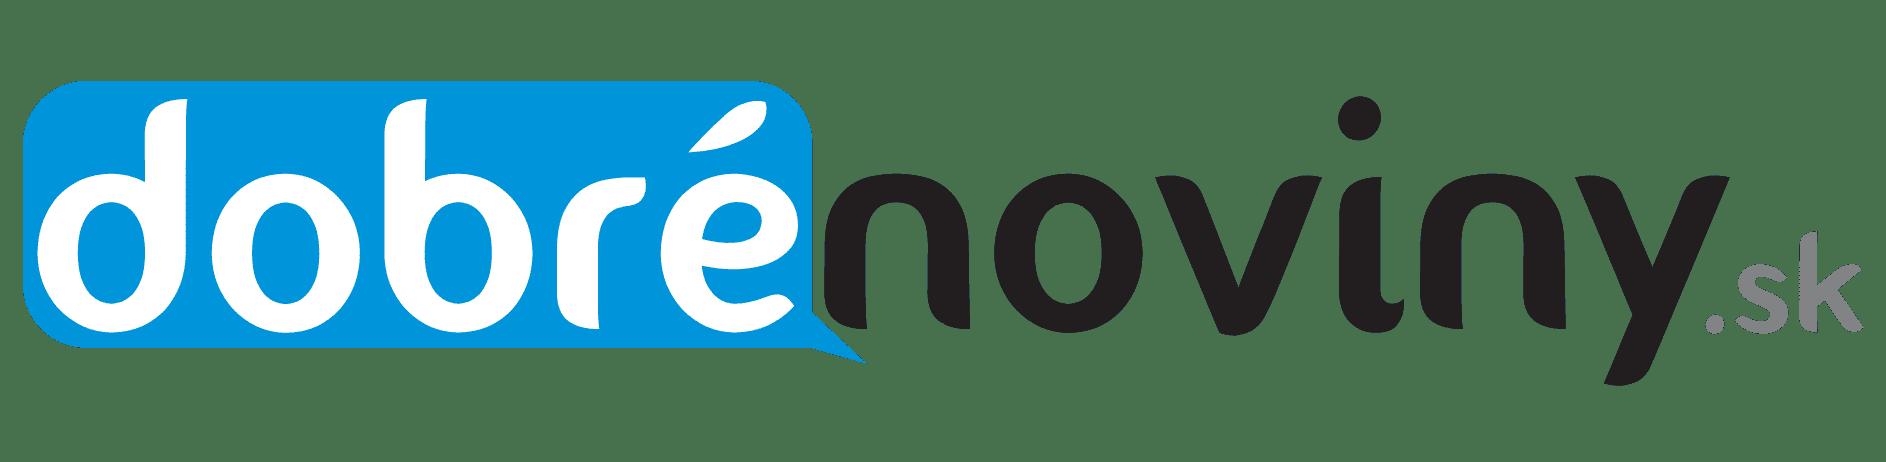 dobre-noviny-logo